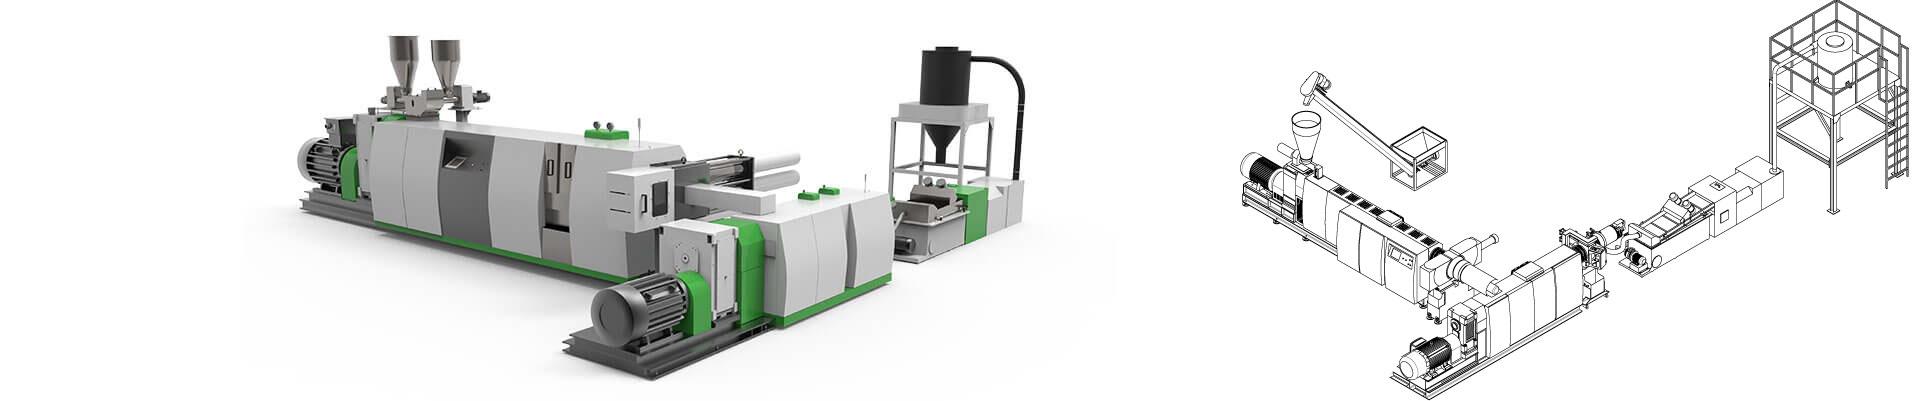 ASE-D 双阶挤出回收造粒生产线